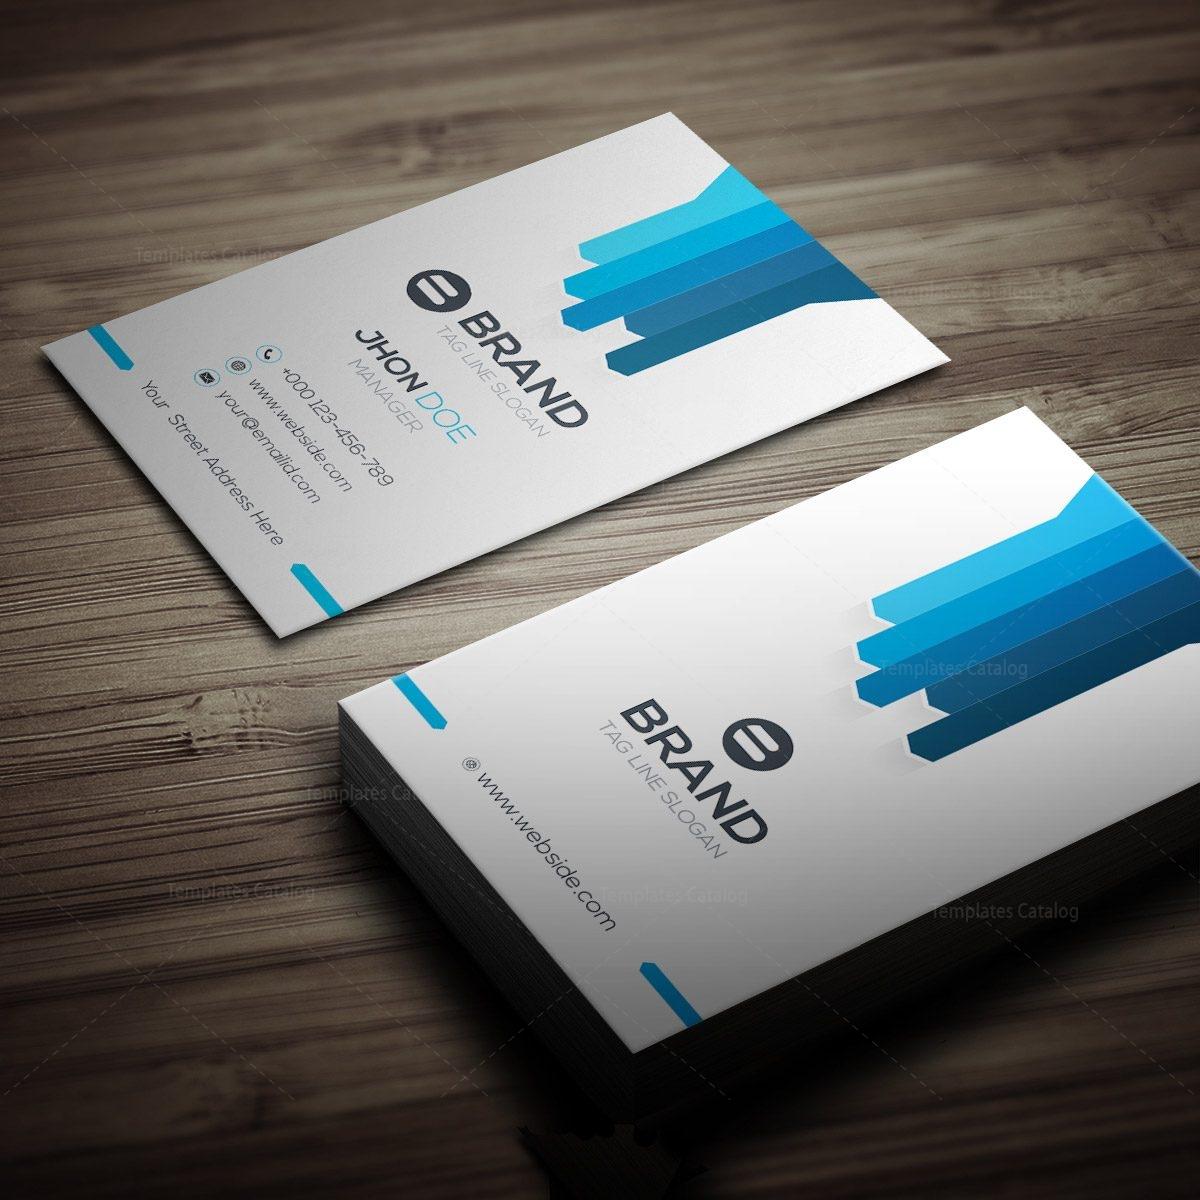 brand vertical business card 000268 template catalog